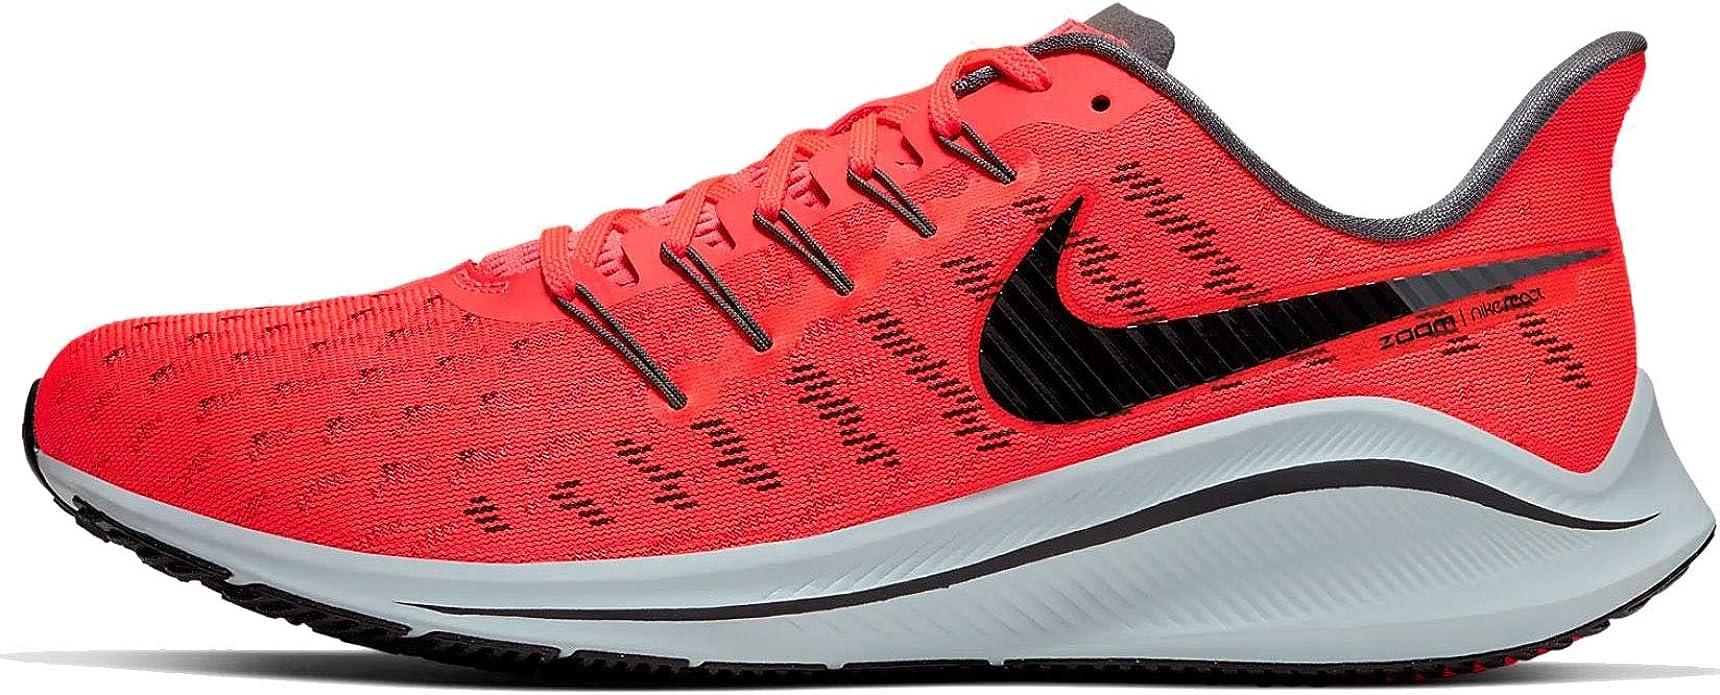 mineral Inspección Supresión  Amazon.com | Nike Men's Running Shoes, US:9 | Road Running